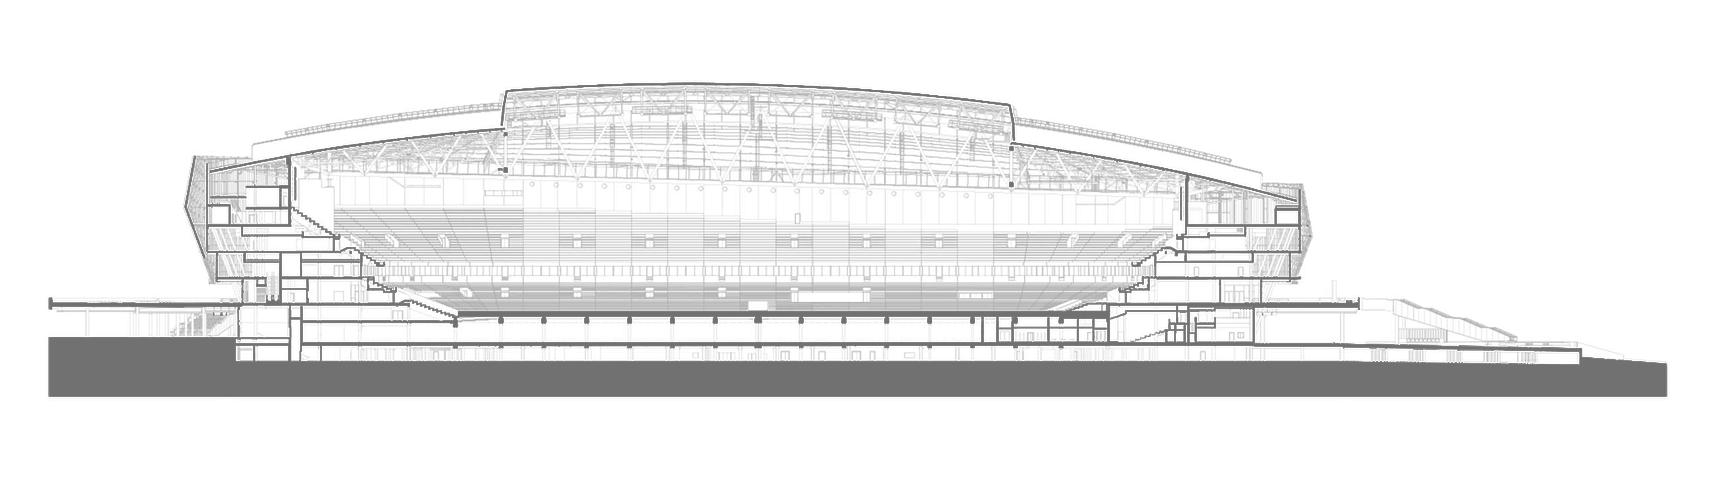 Arena Tele2 / White arkitekter. Corte Longitudinal